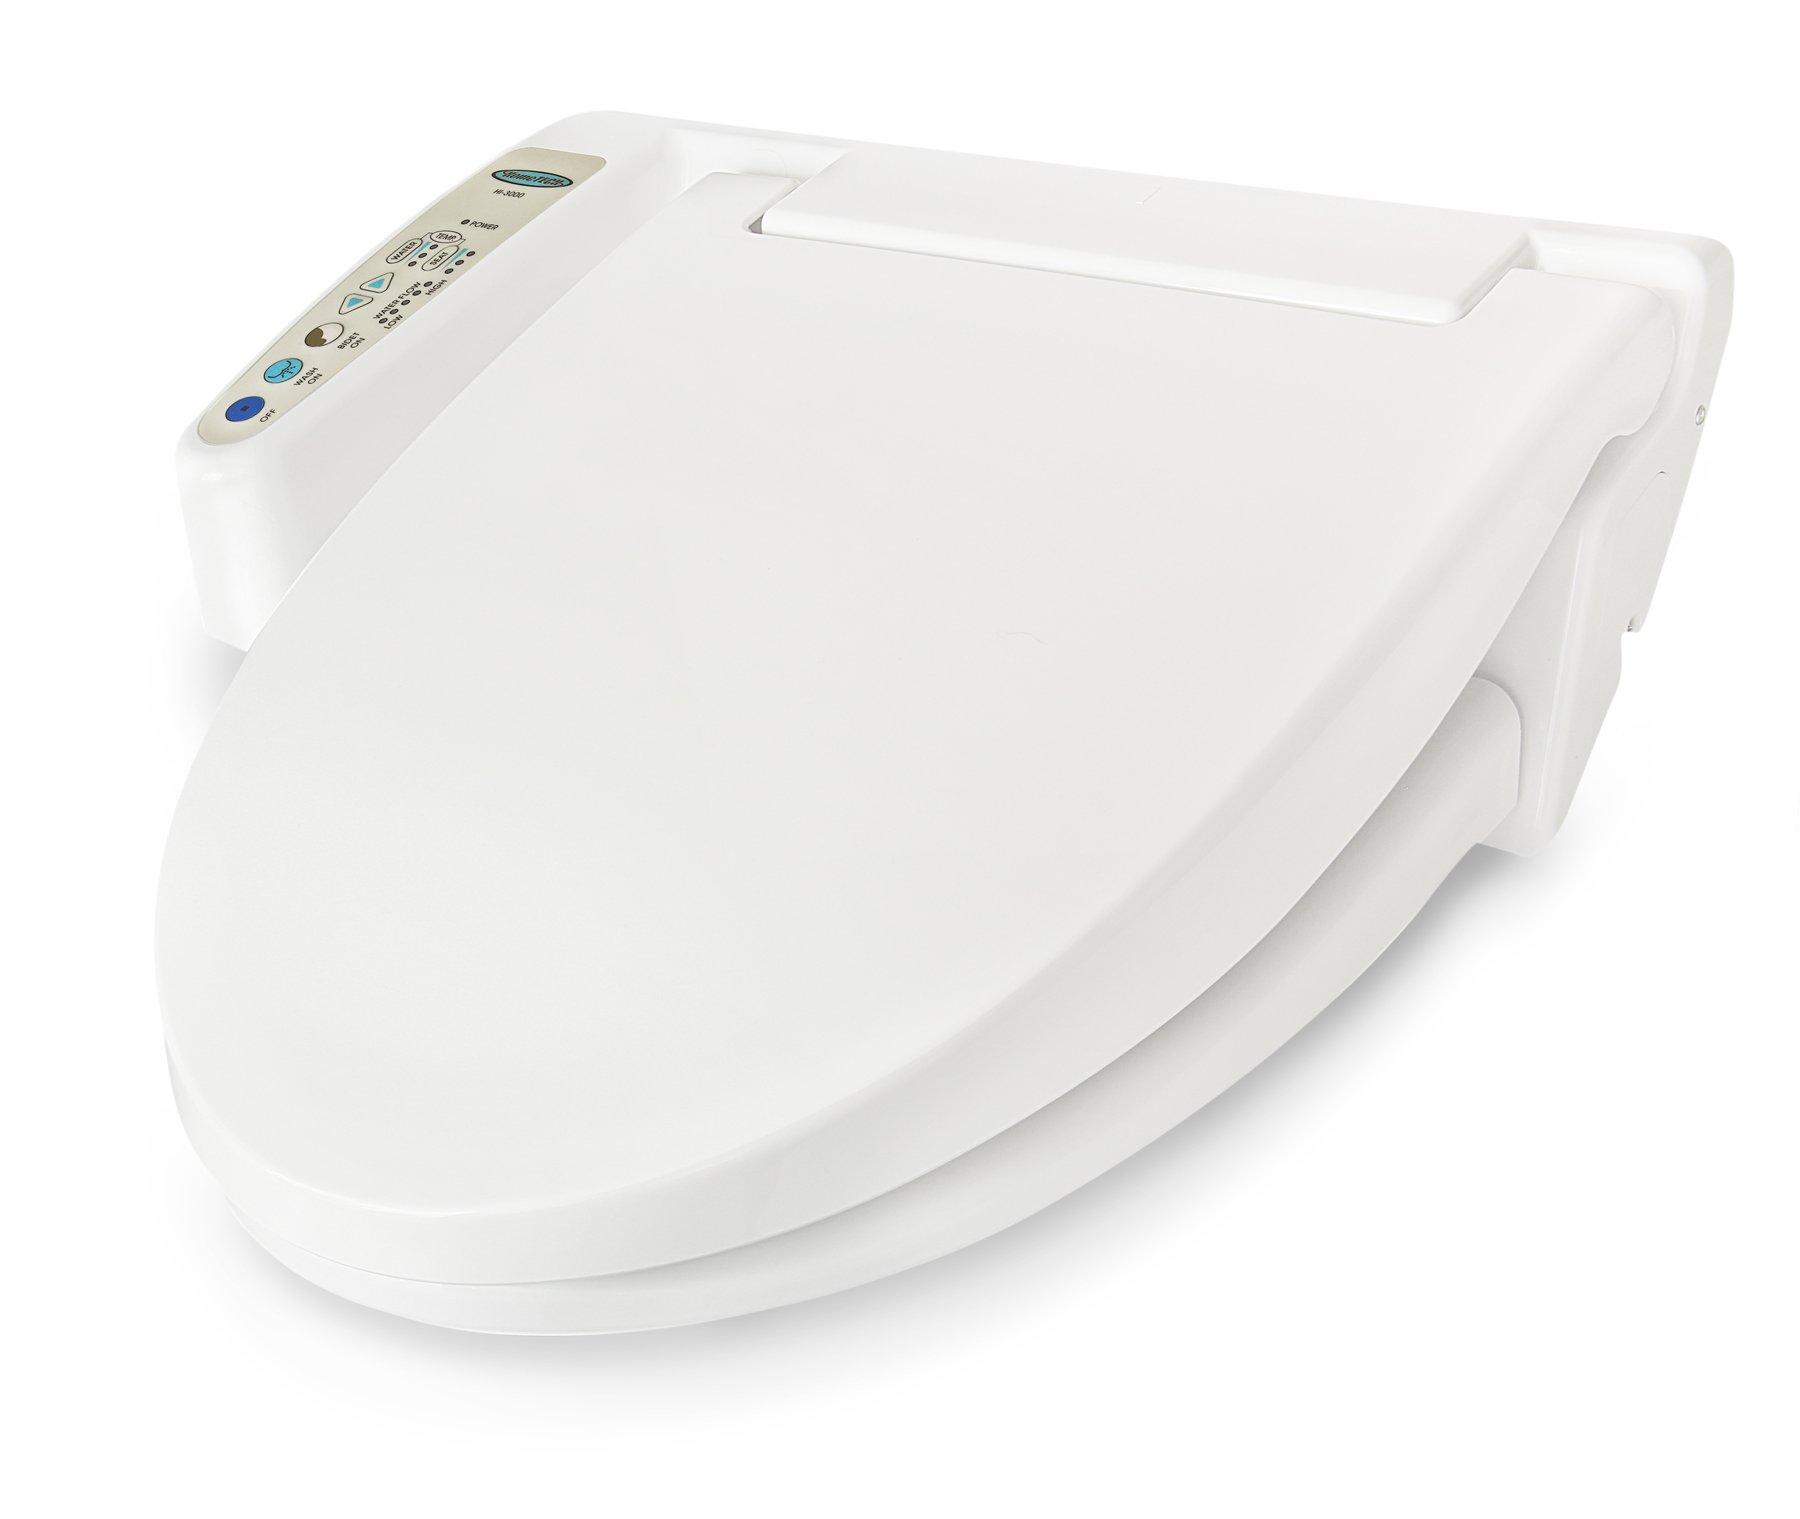 Hometech Feel Fresh HI-4000WT Round and Elongate Bidet with Warm Air Dryer White